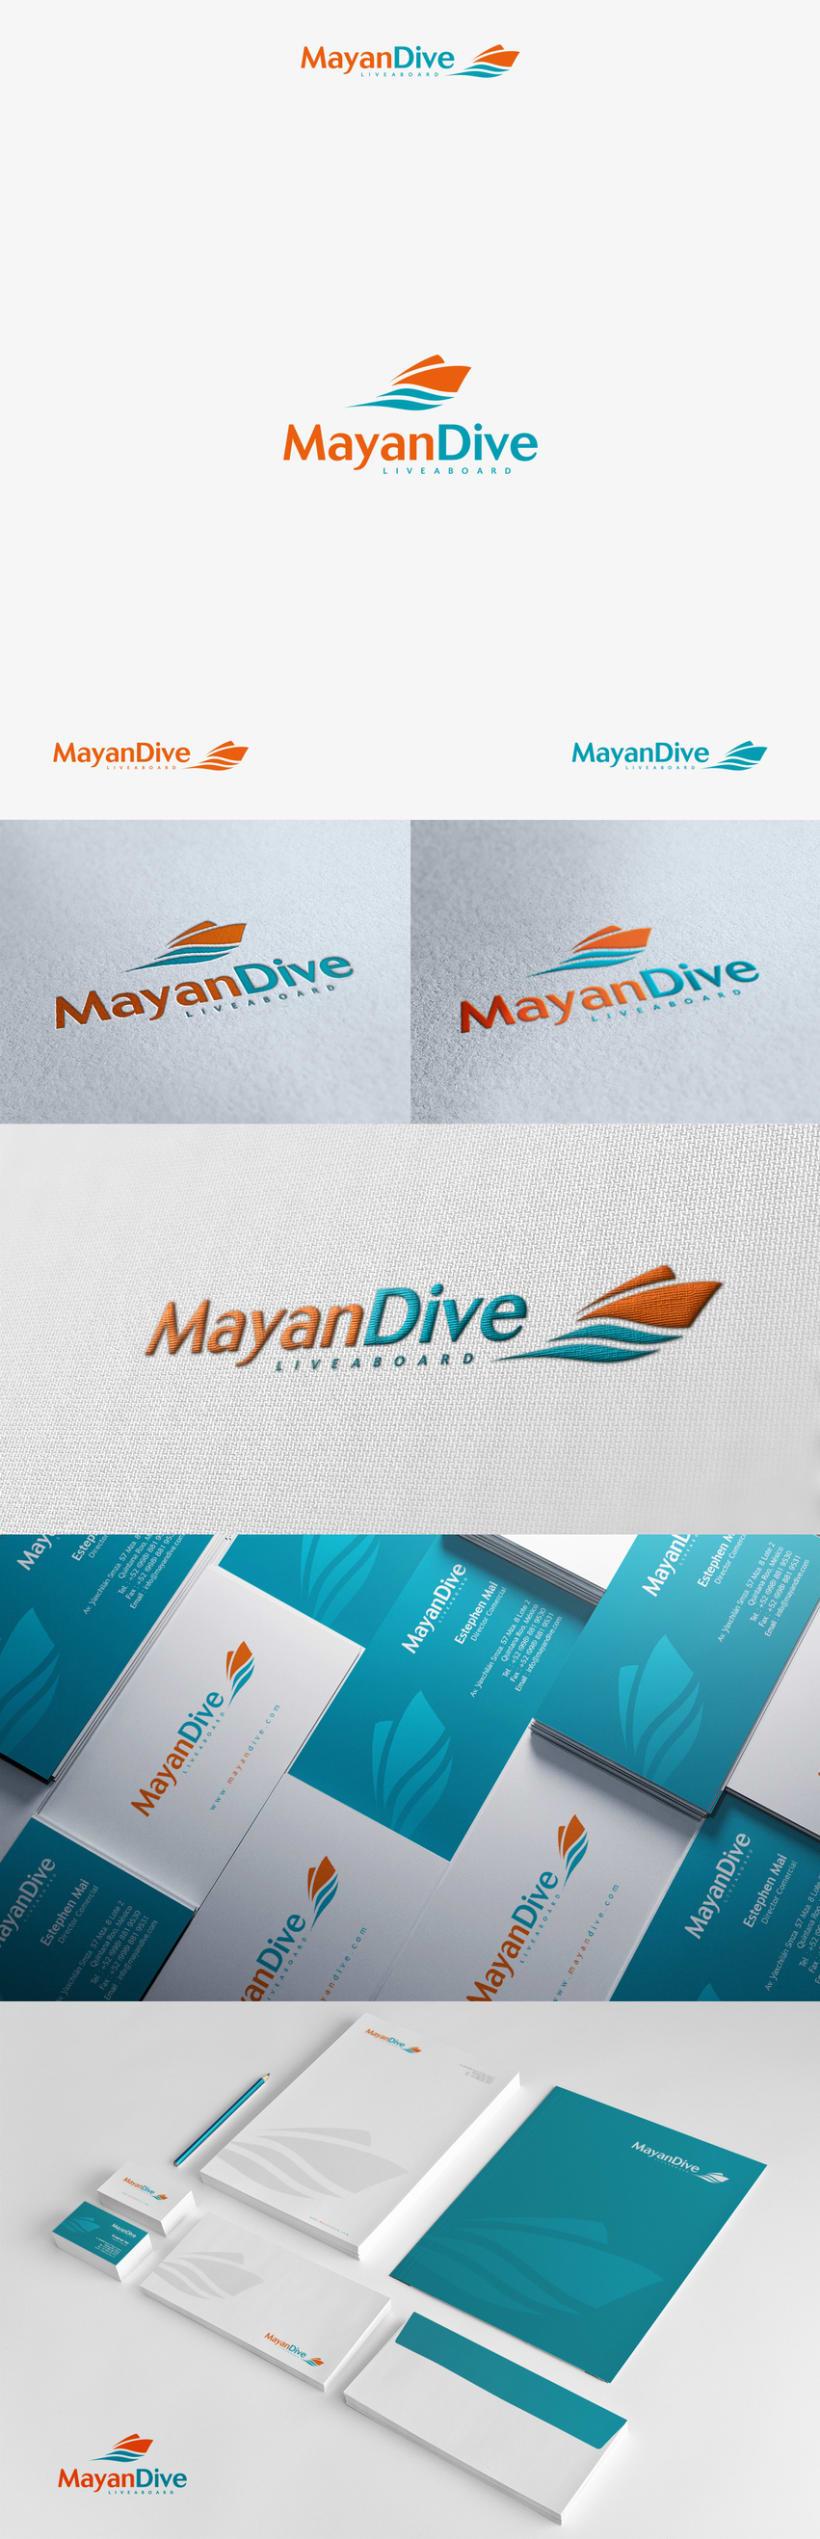 BRANDING - MayanDive (Cruceros de buceo) -1